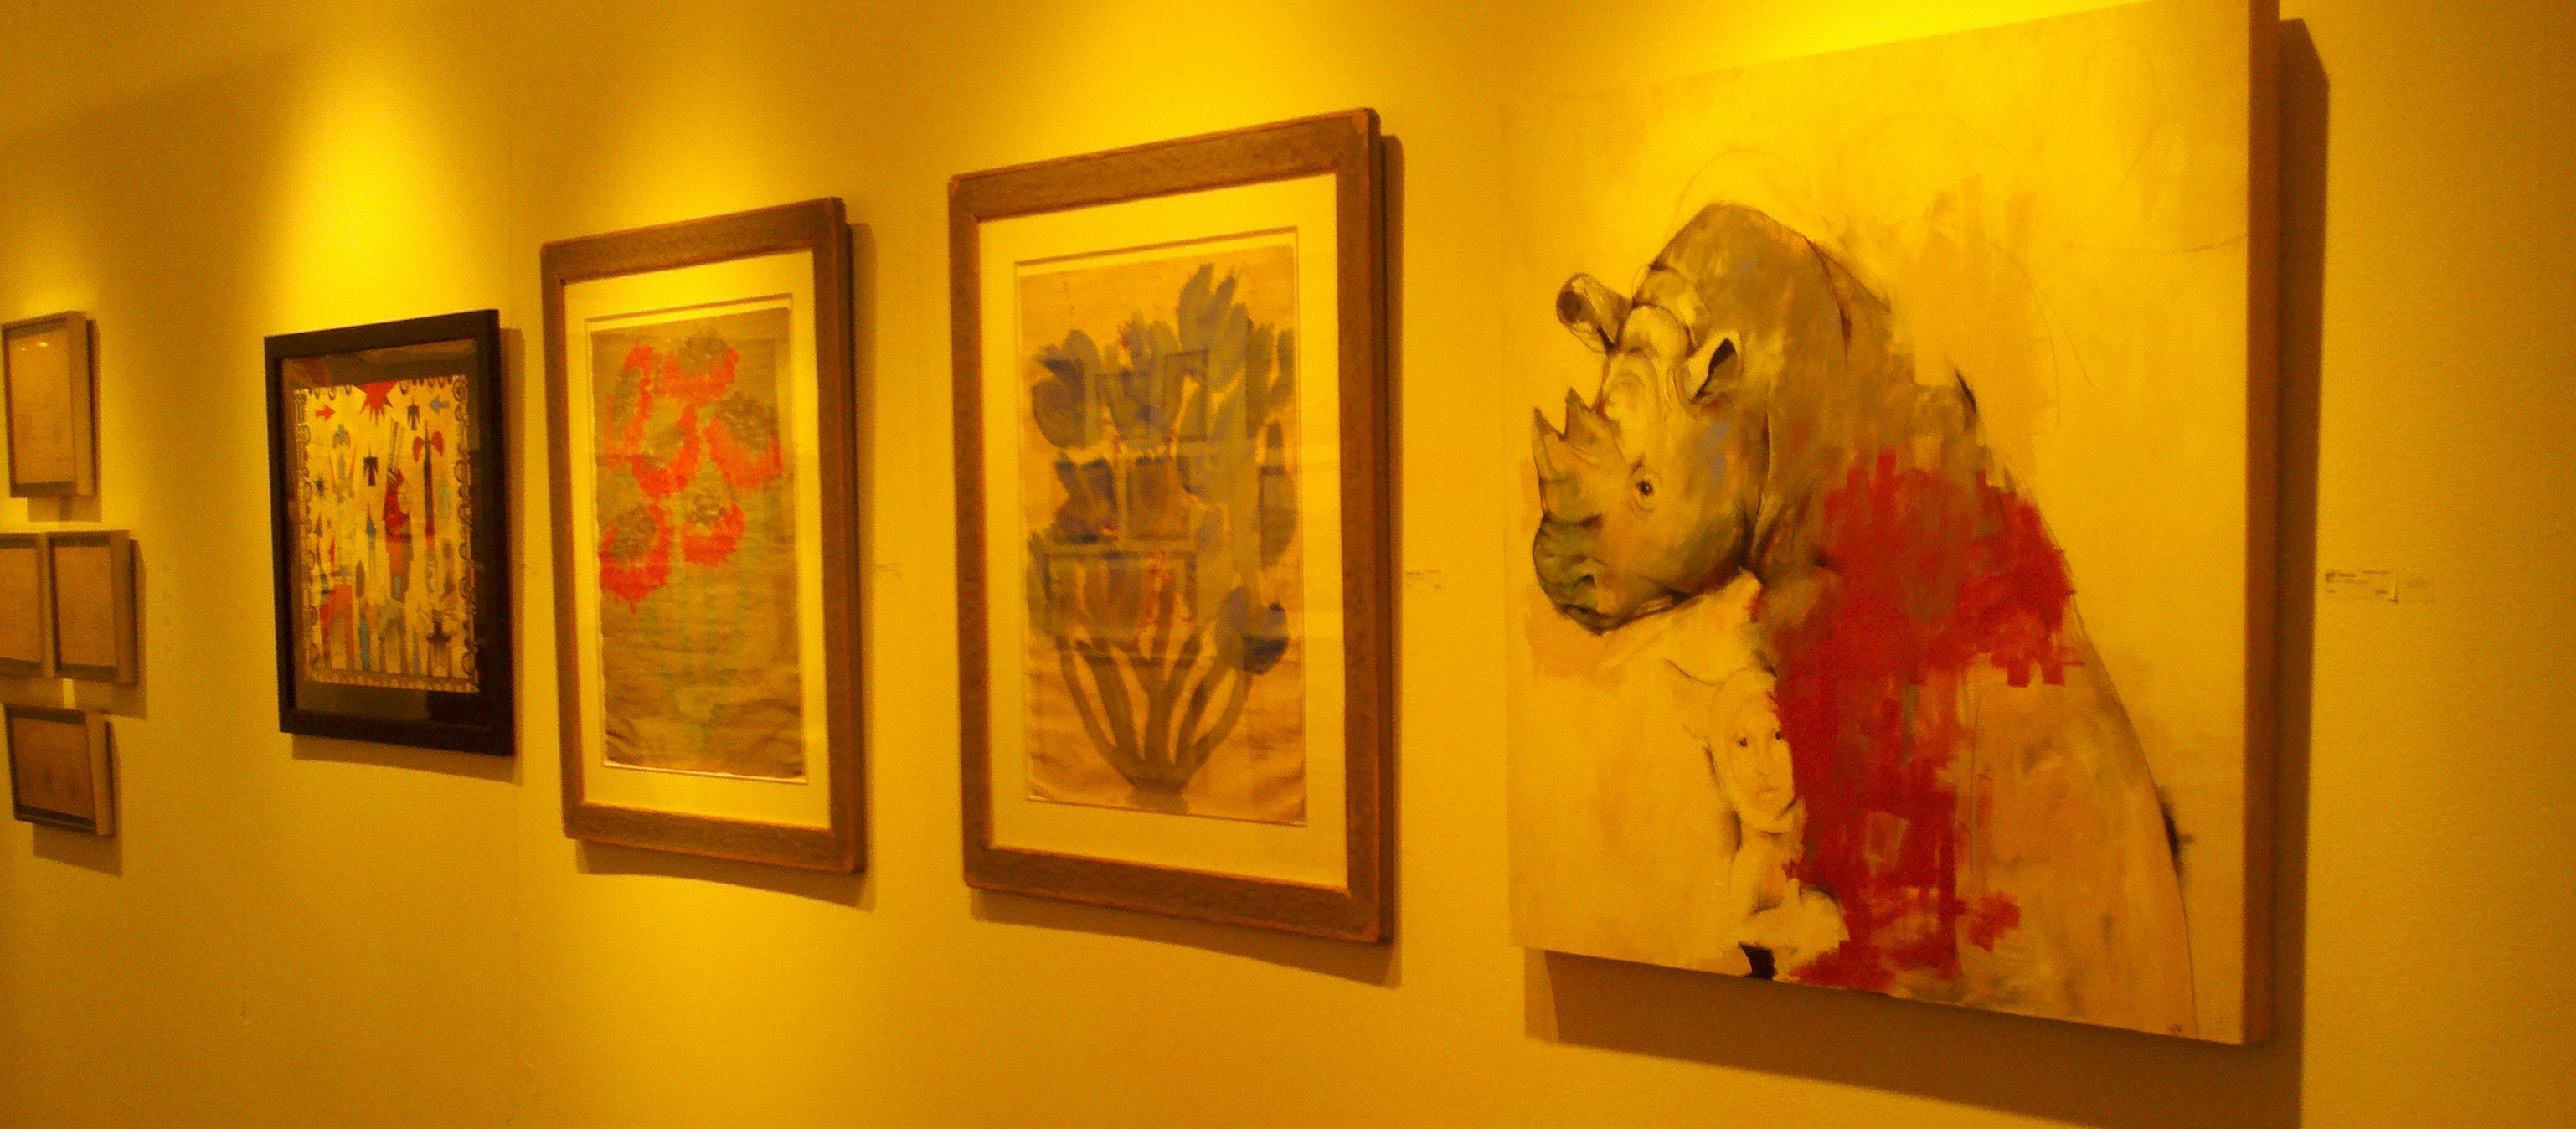 nyc-show-2-2012